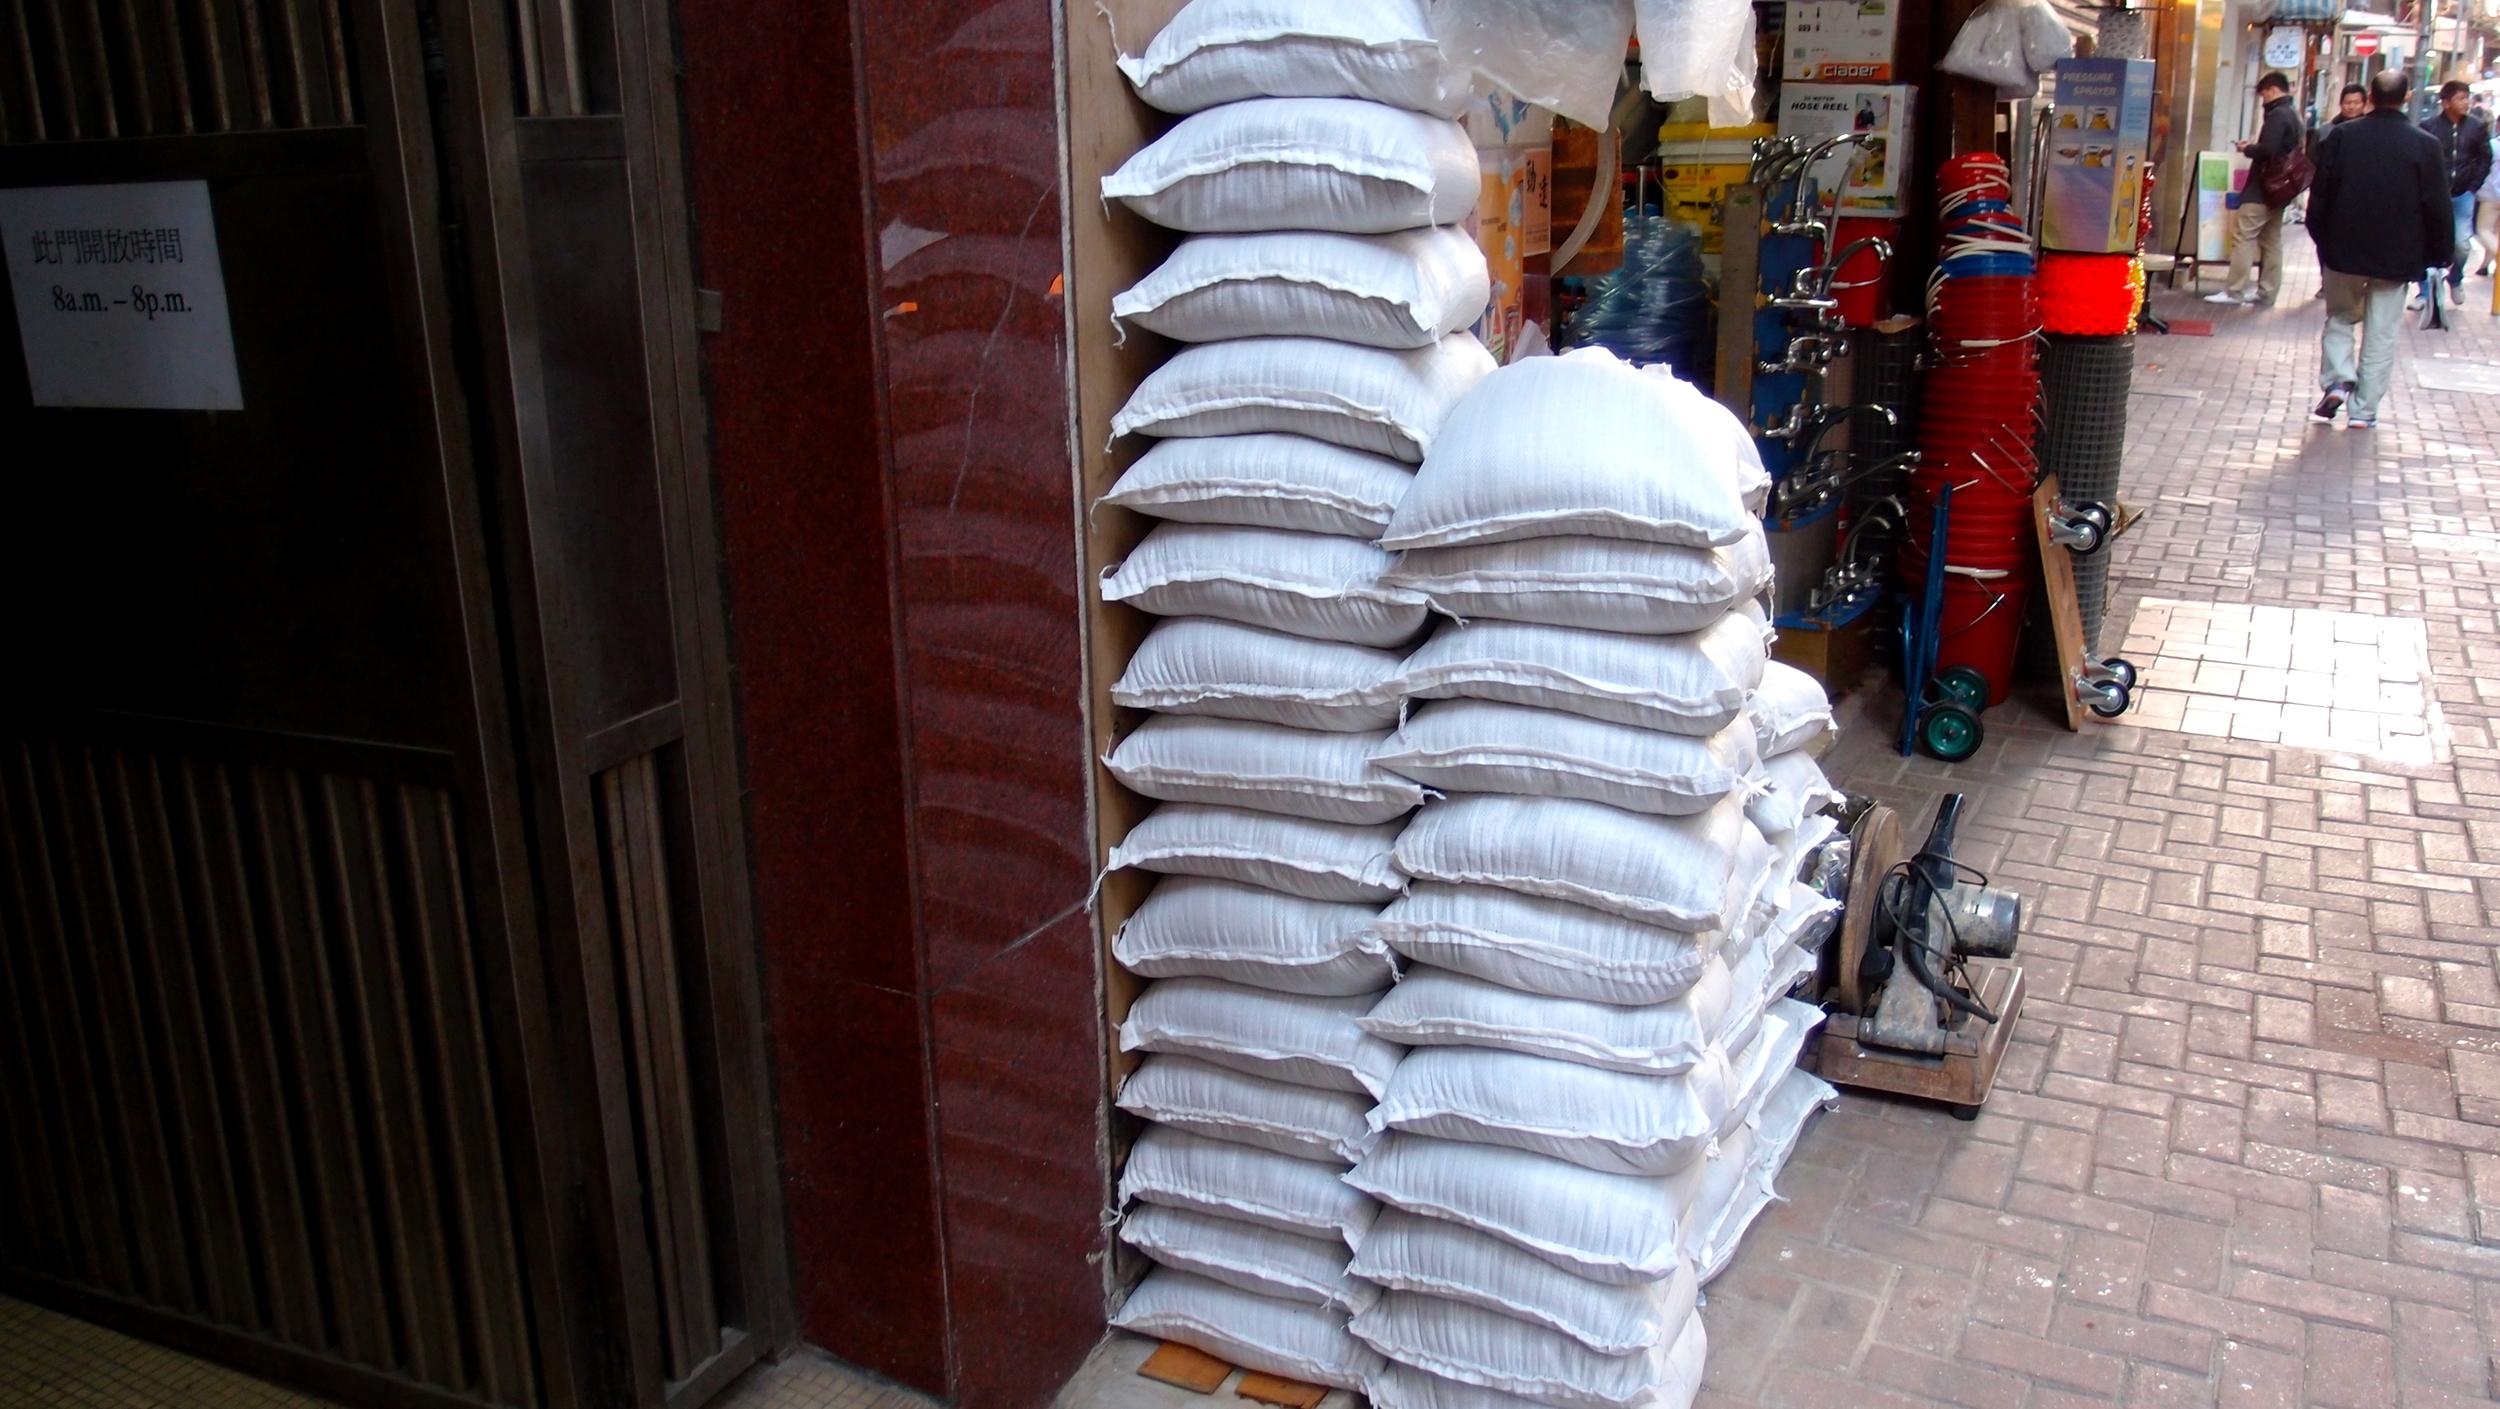 Now I know where to buy sandbags